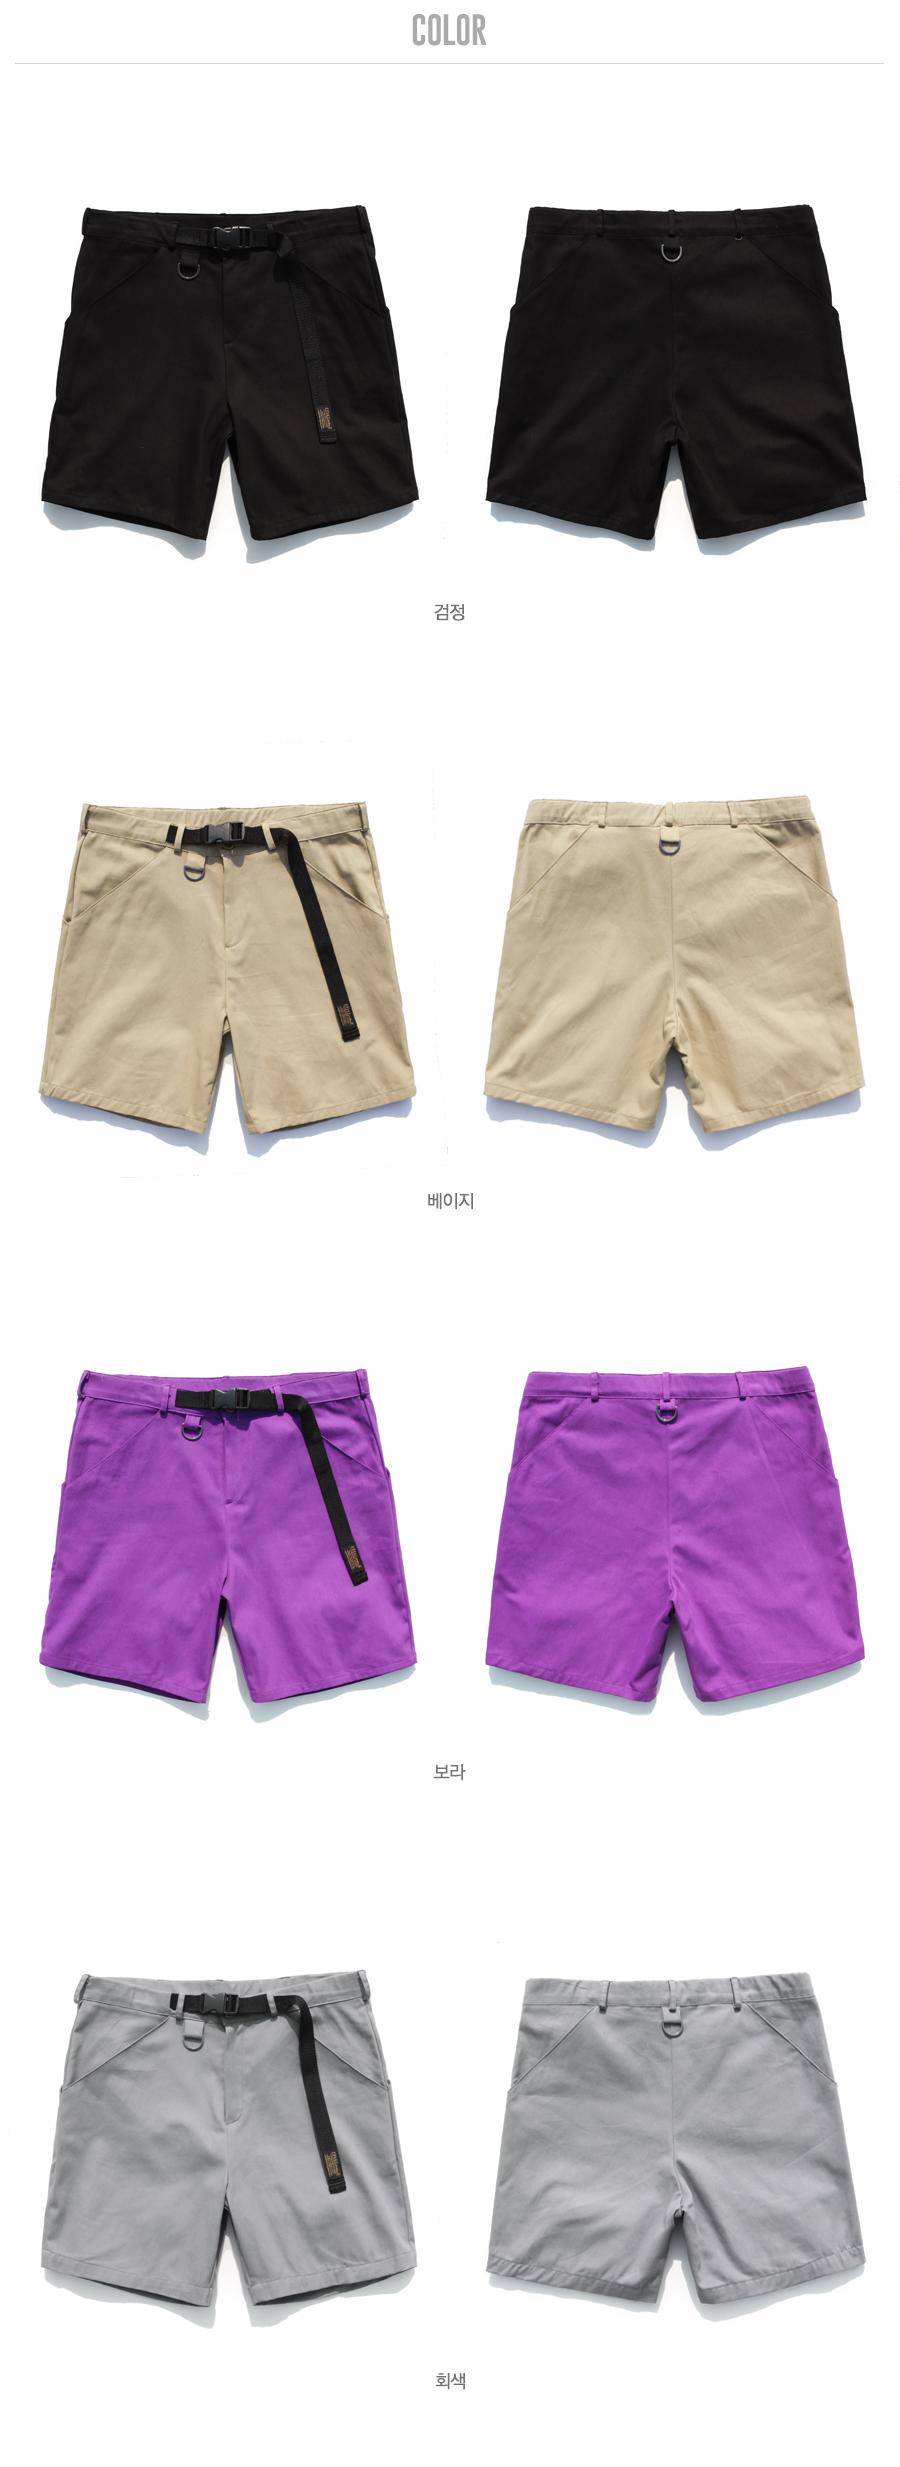 20180423_fp_outlook_short_pants_color_uk.jpg